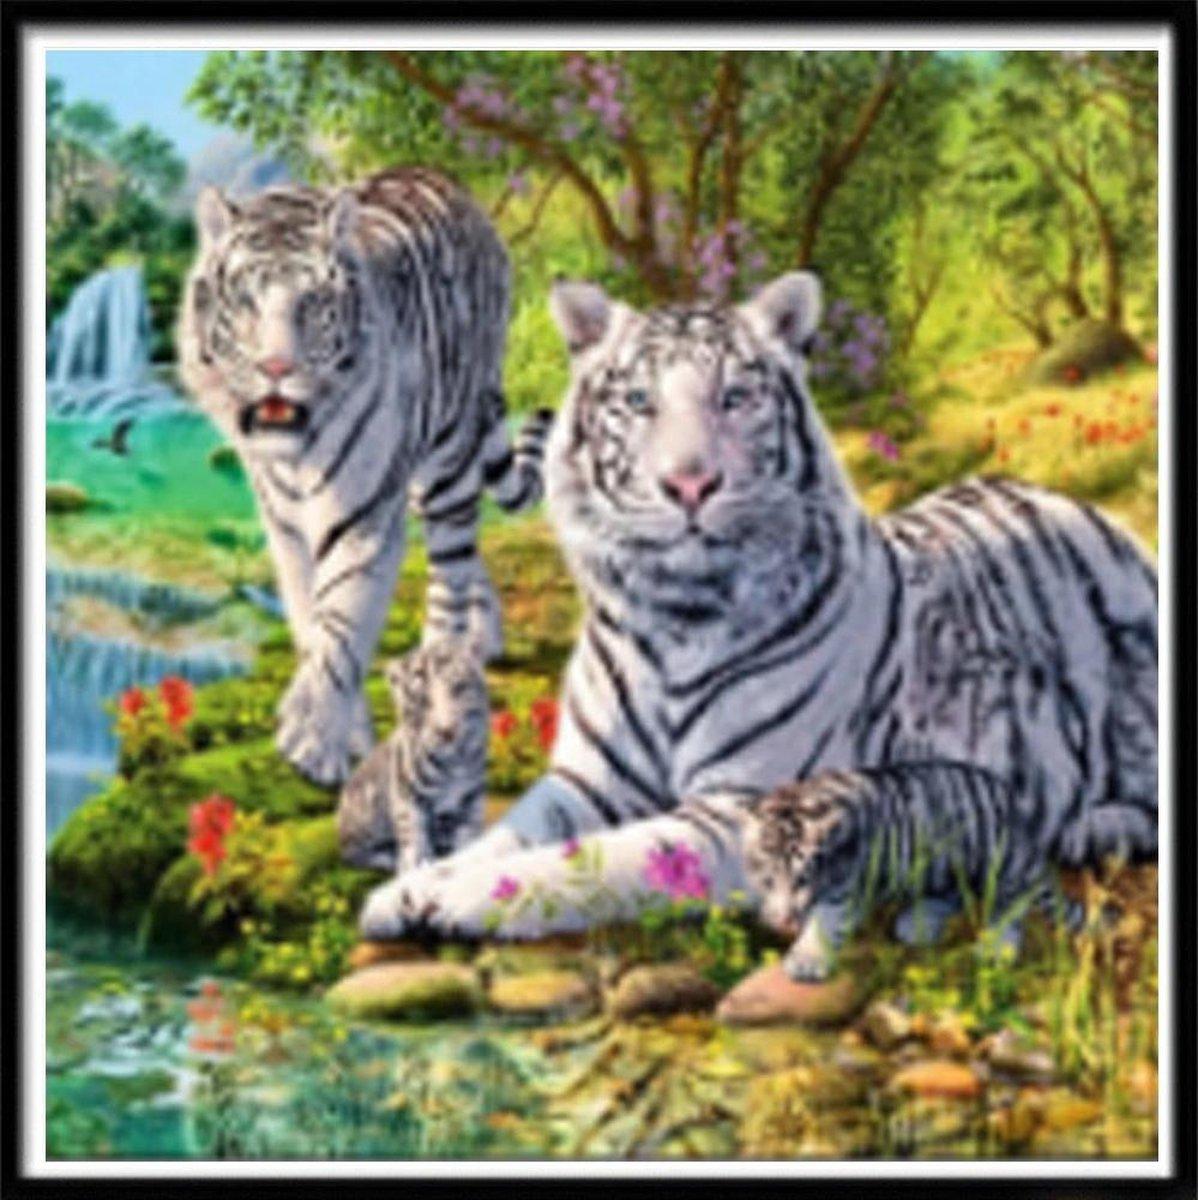 Premium Paintings - Twee Witte Tijgers - Diamond Painting Volwassenen - Pakket Volledig / Pakket Full - 40x40 cm - Moederdag cadeautje